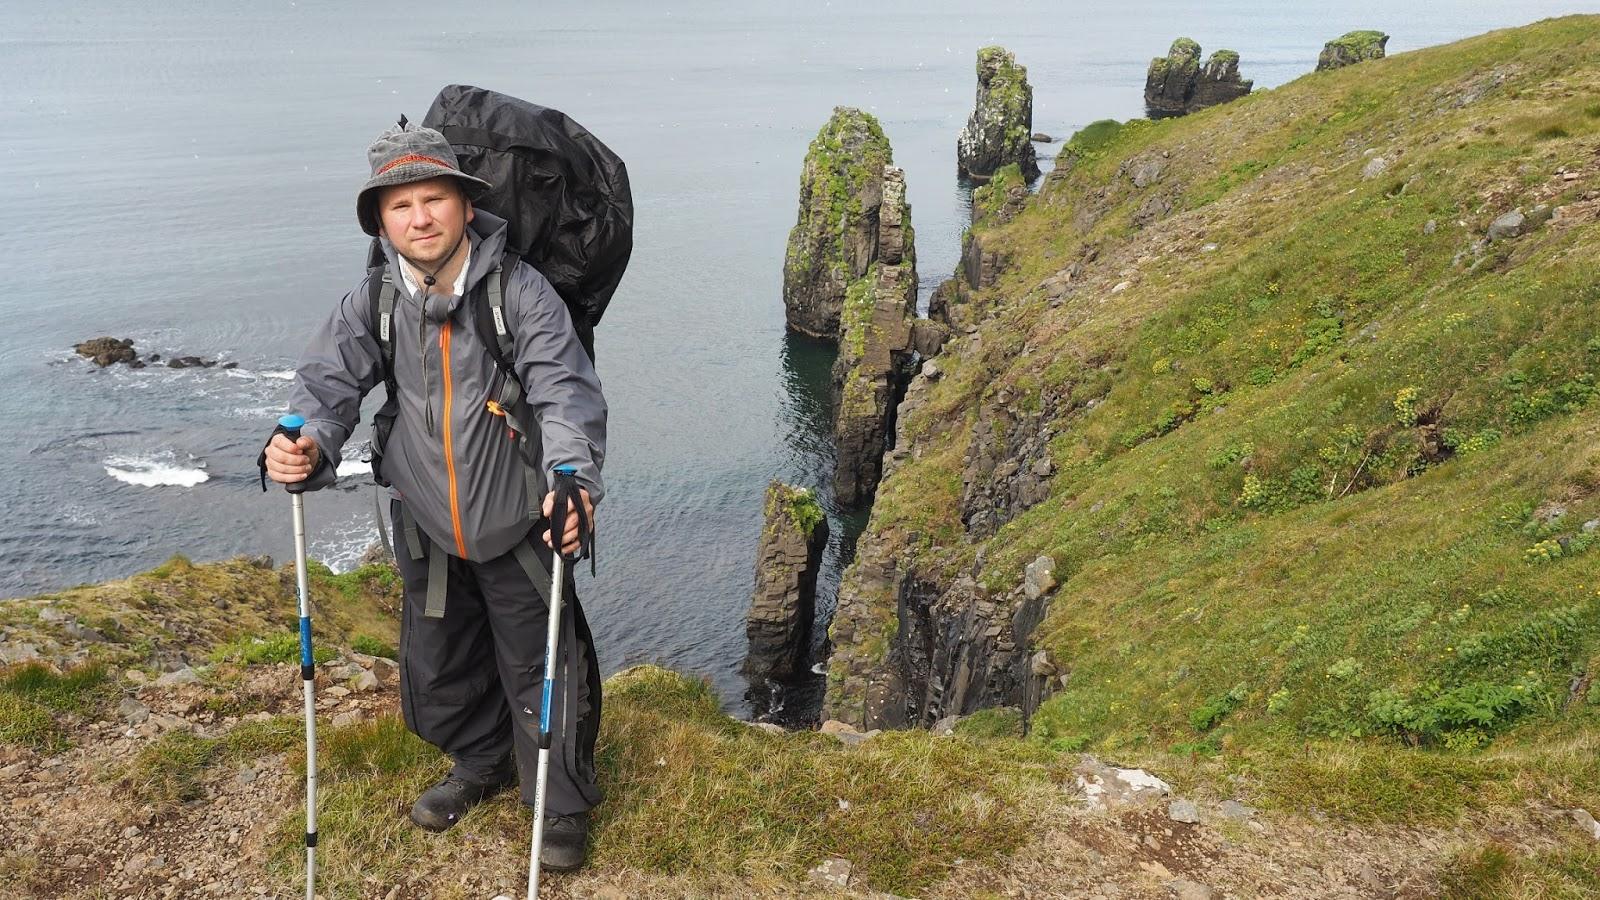 trekking na Islandii, trekking Hornstrandir, zwiedzanie Islandii